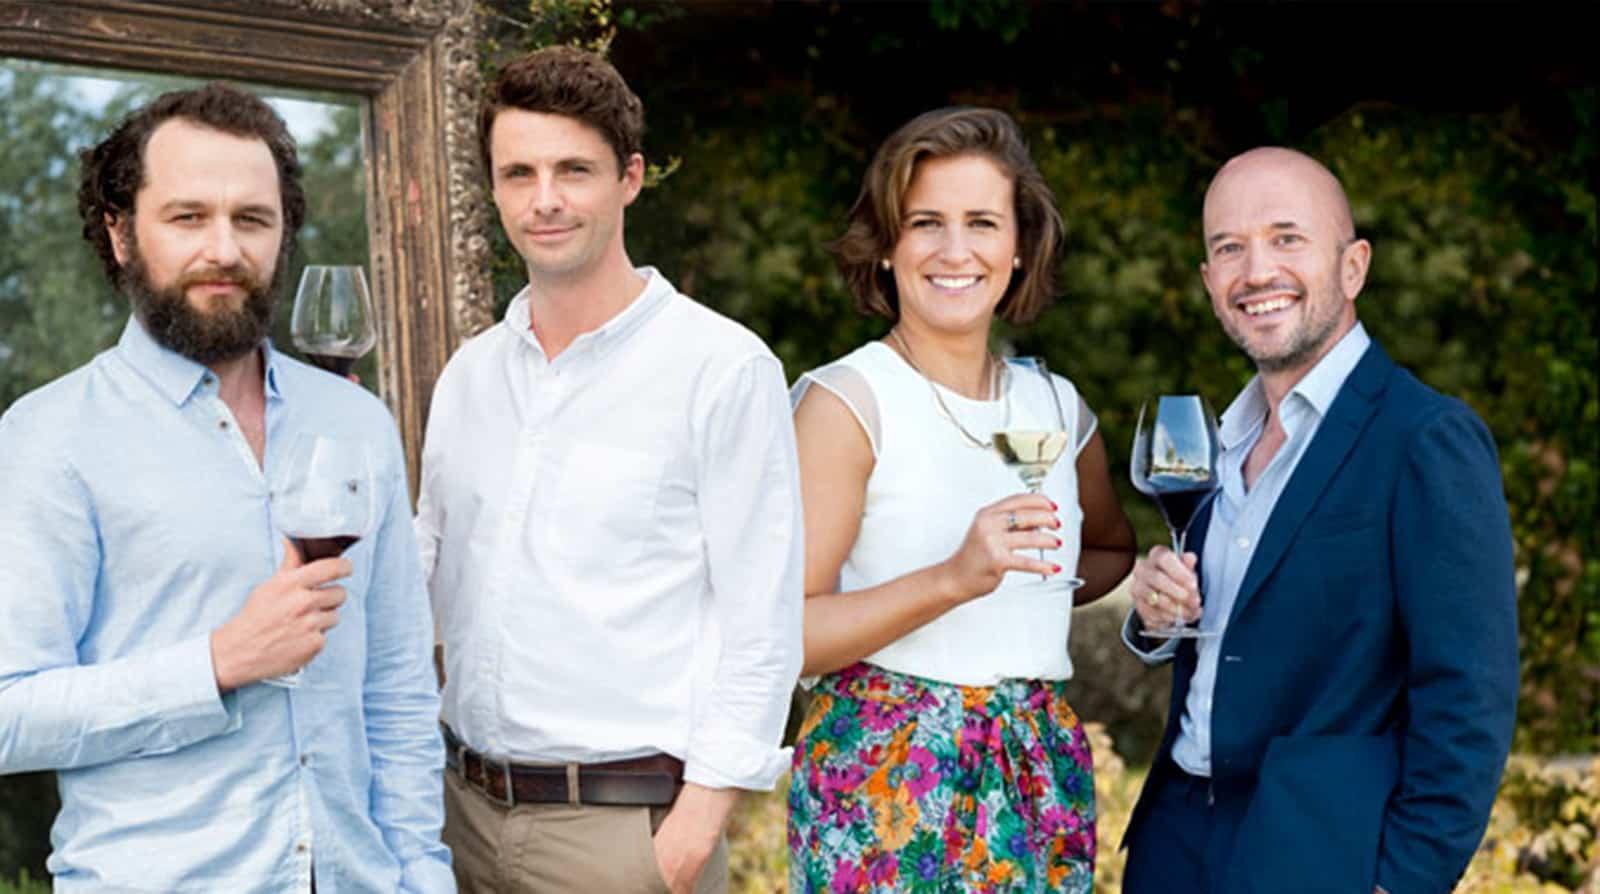 Le wine show